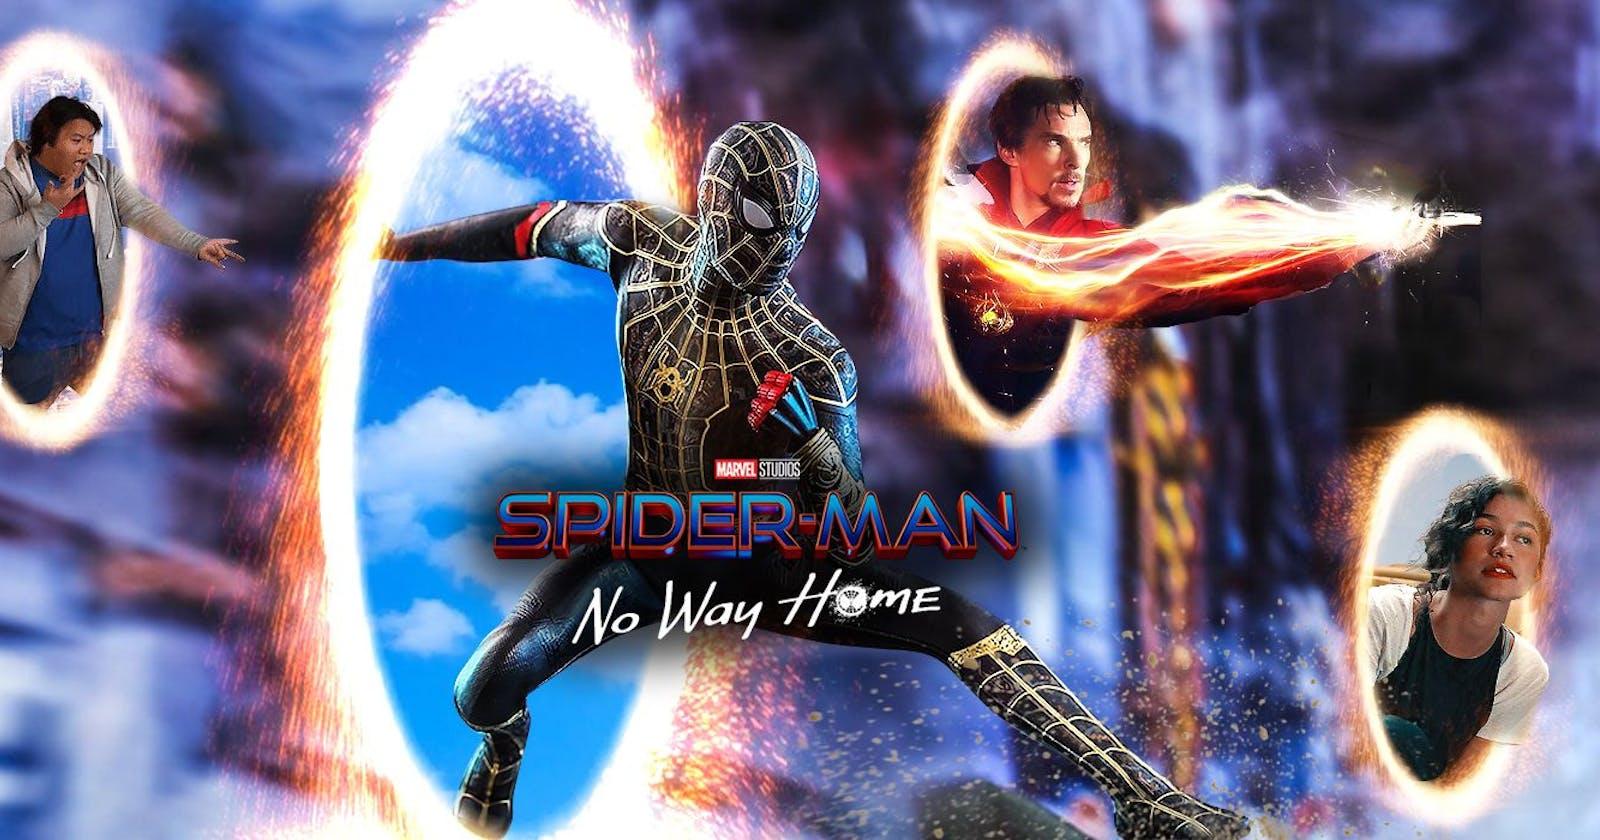 Spider-Man beats Avengers In Views